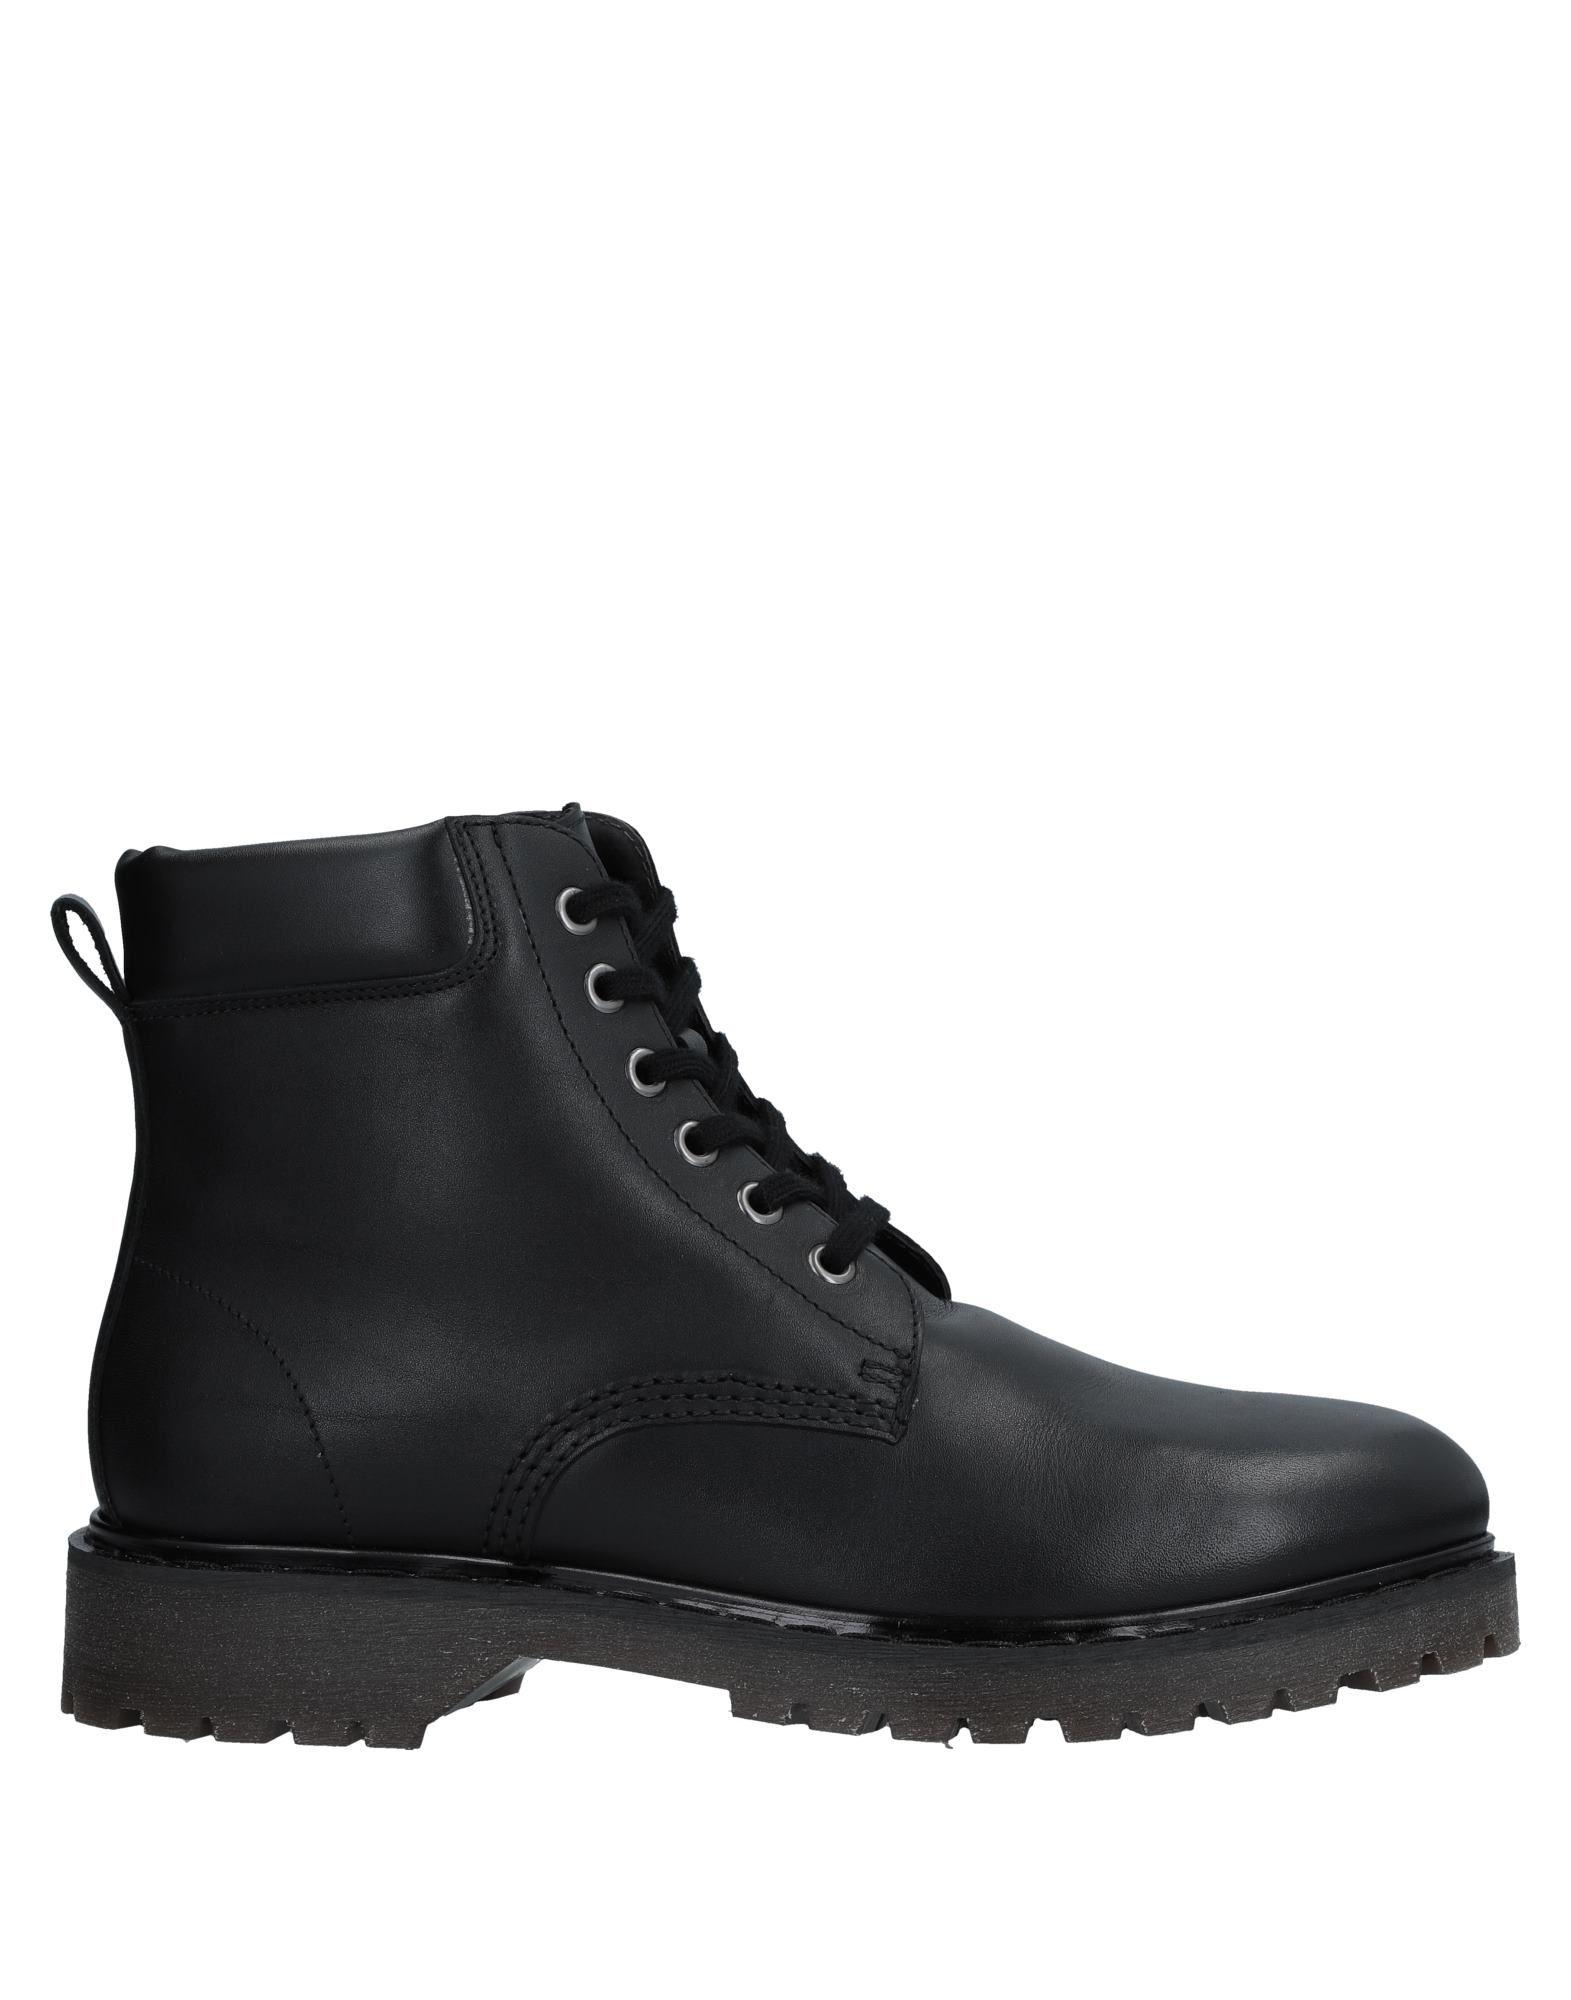 Rabatt echte Schuhe Antica Cuoieria Stiefelette Herren  11529217RP